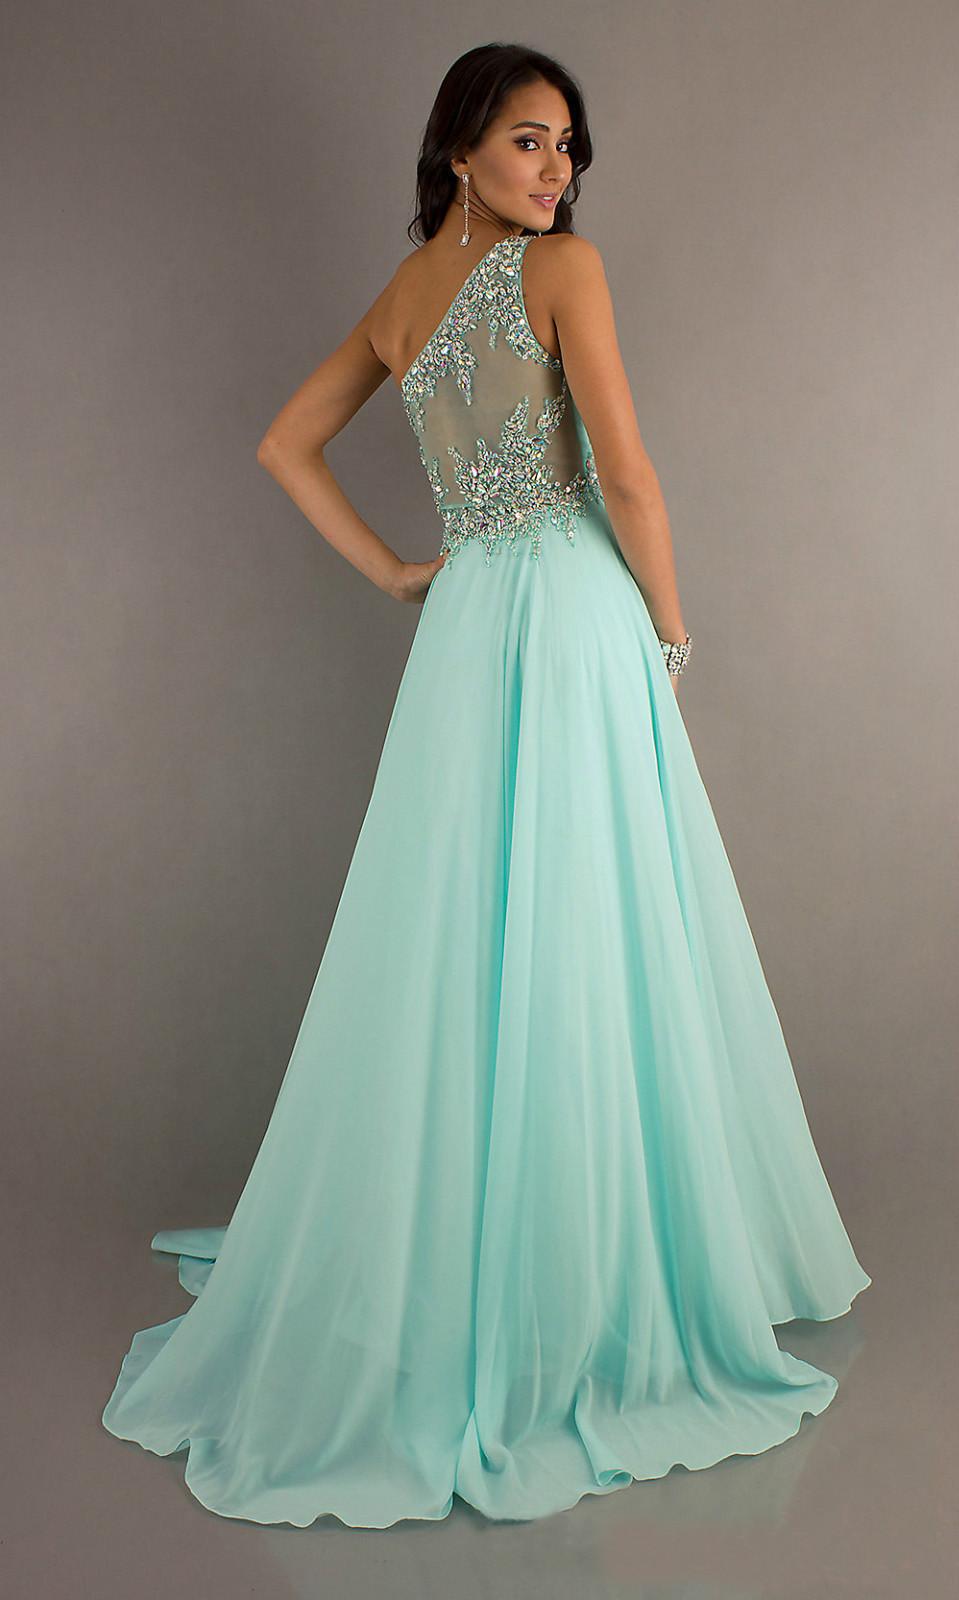 Halter dress my0127fy